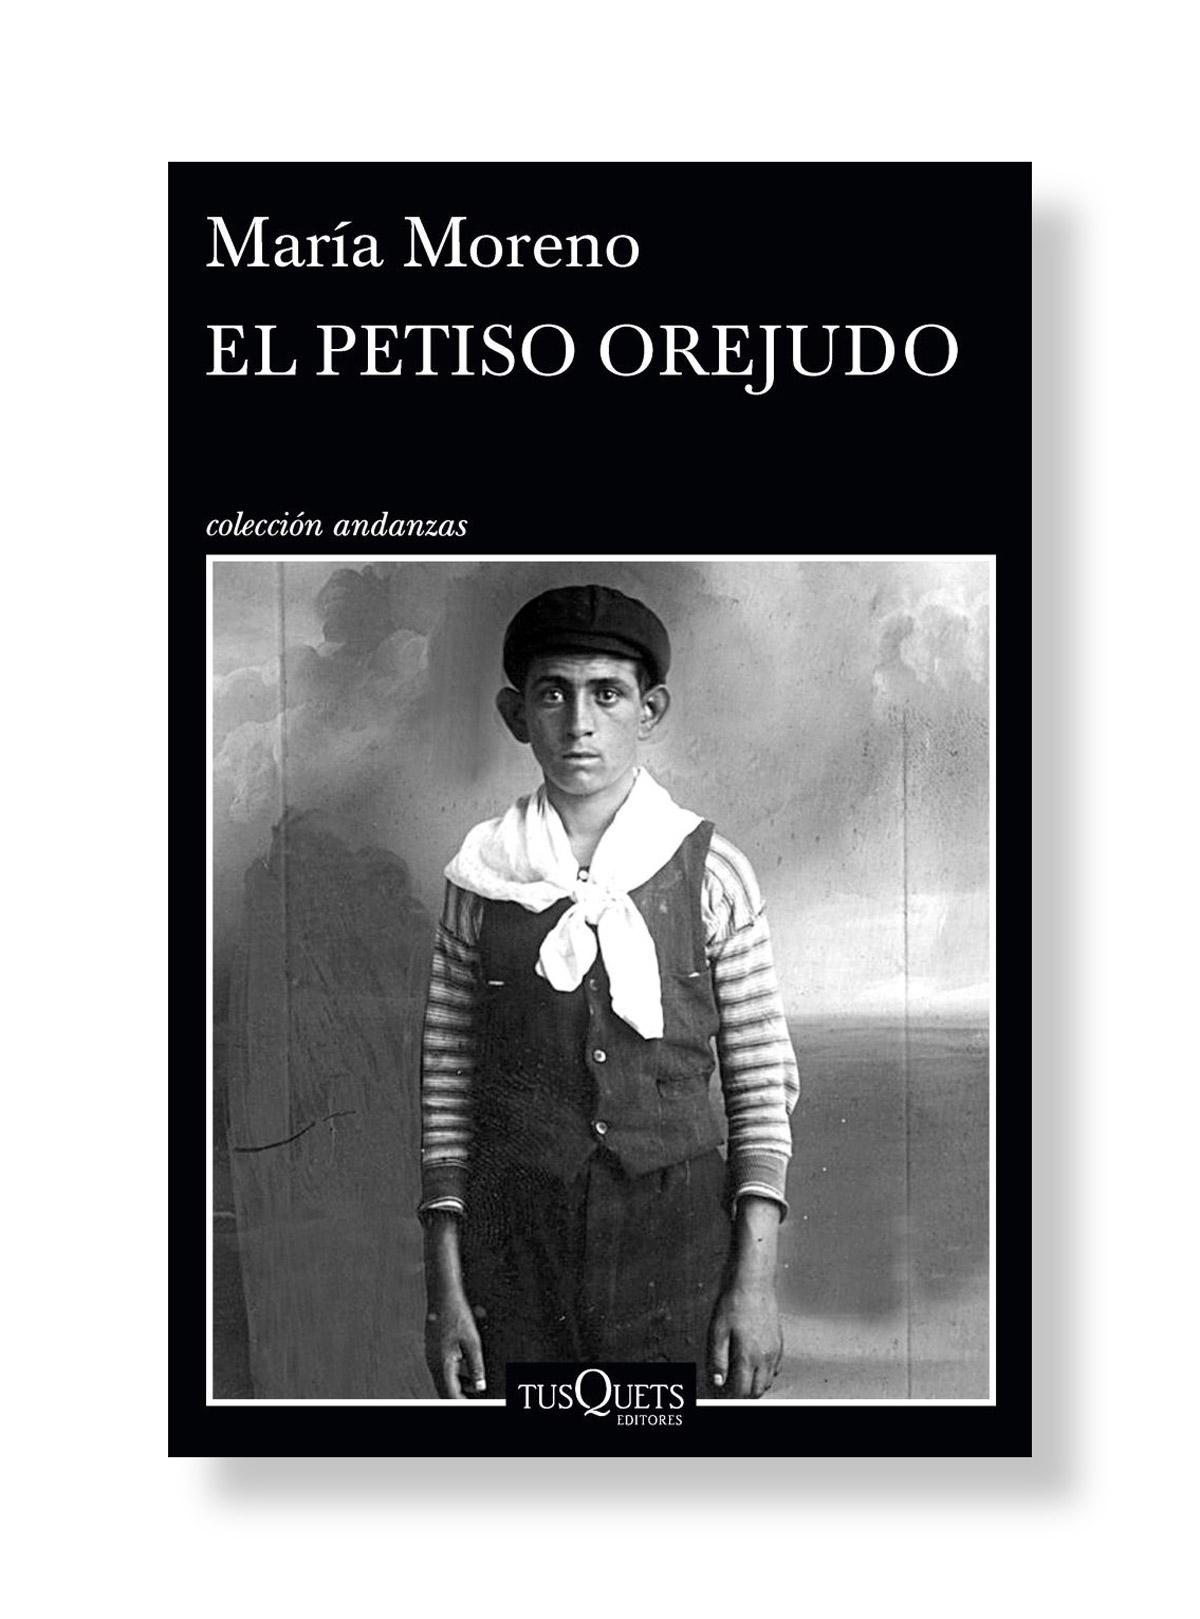 maria-moreno_-petiso-orejudo_02